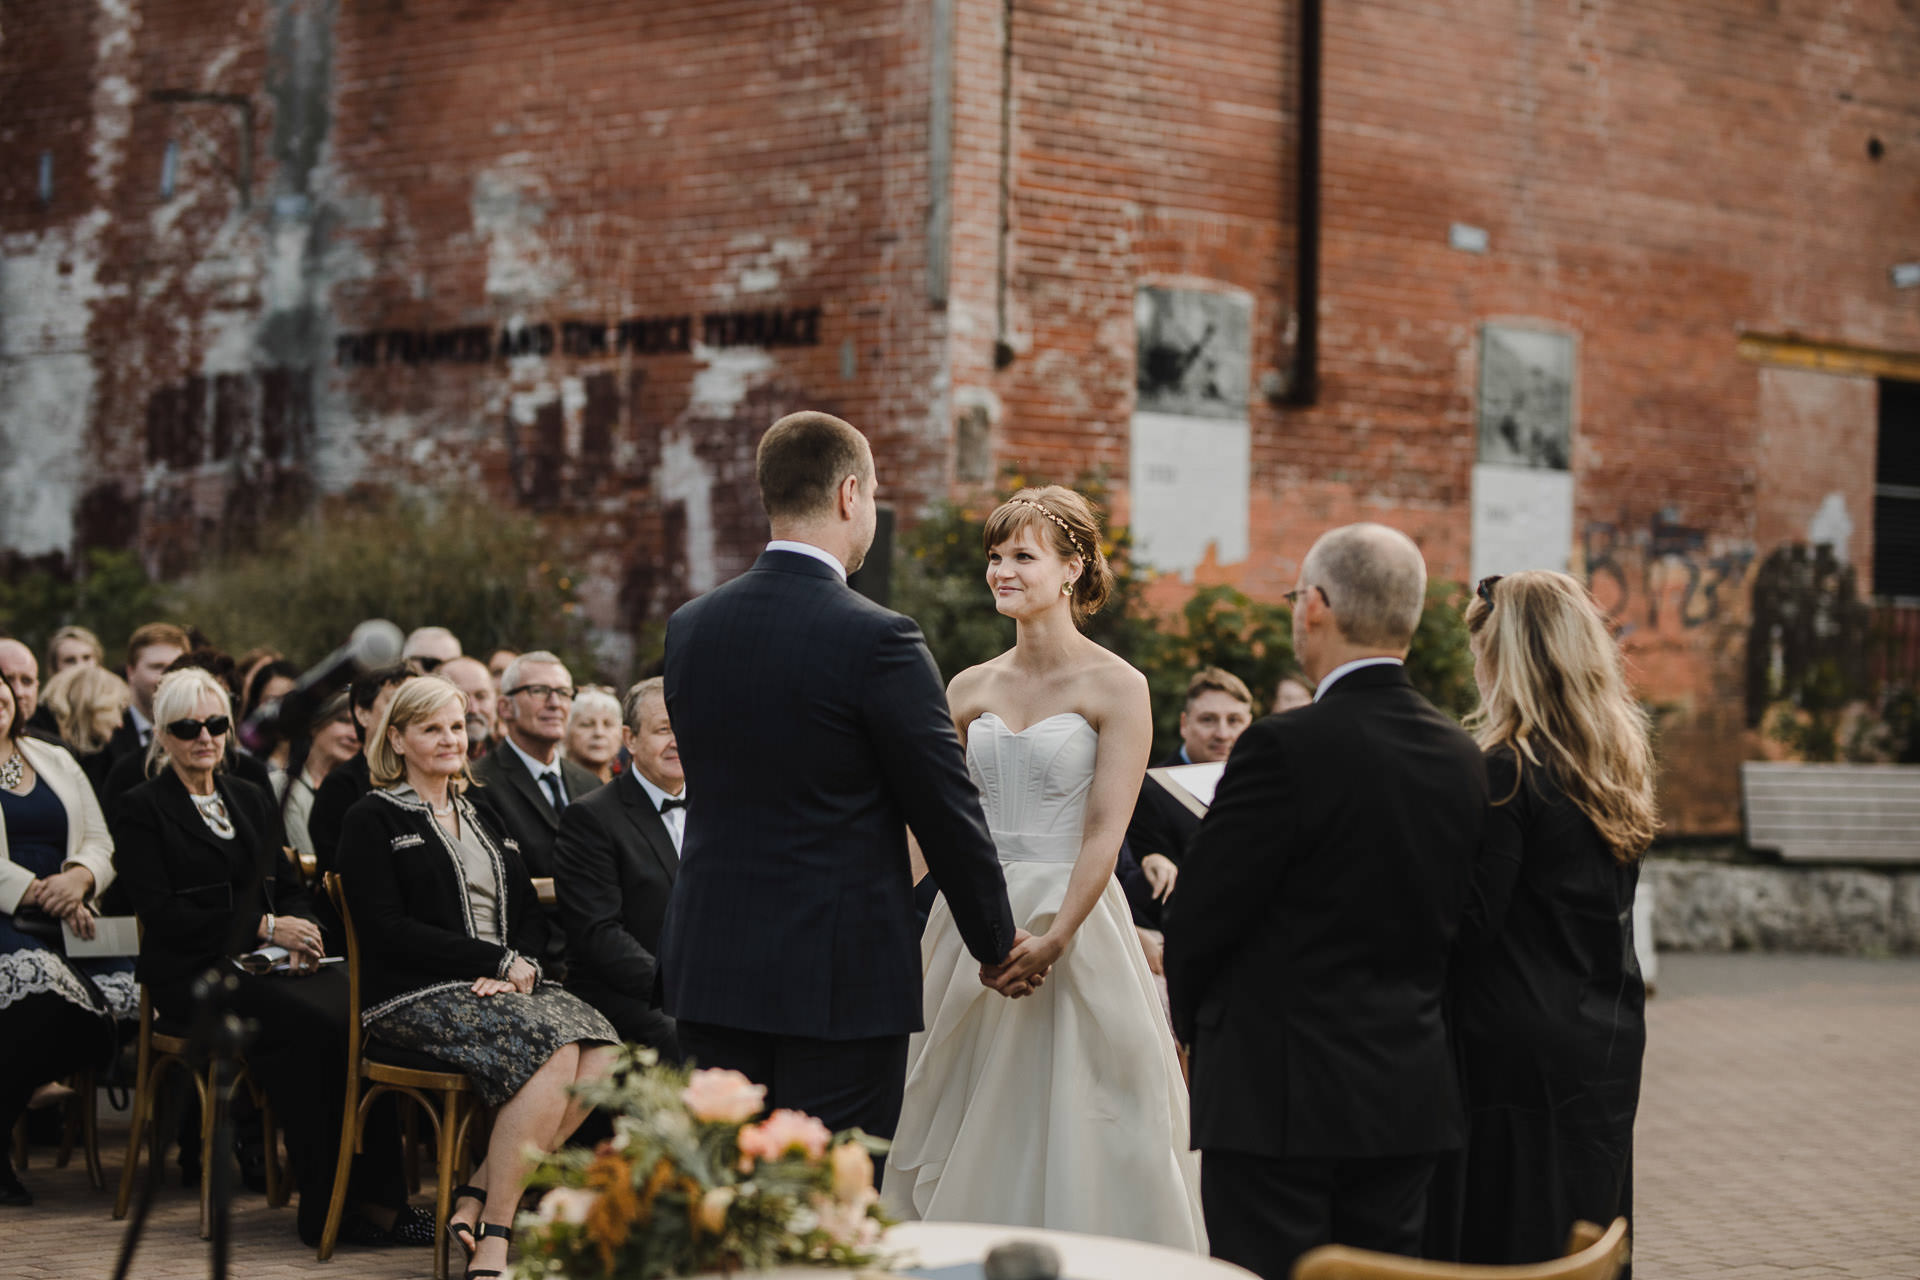 Evergreen Brickworks wedding photographer - bride and groom holding hands